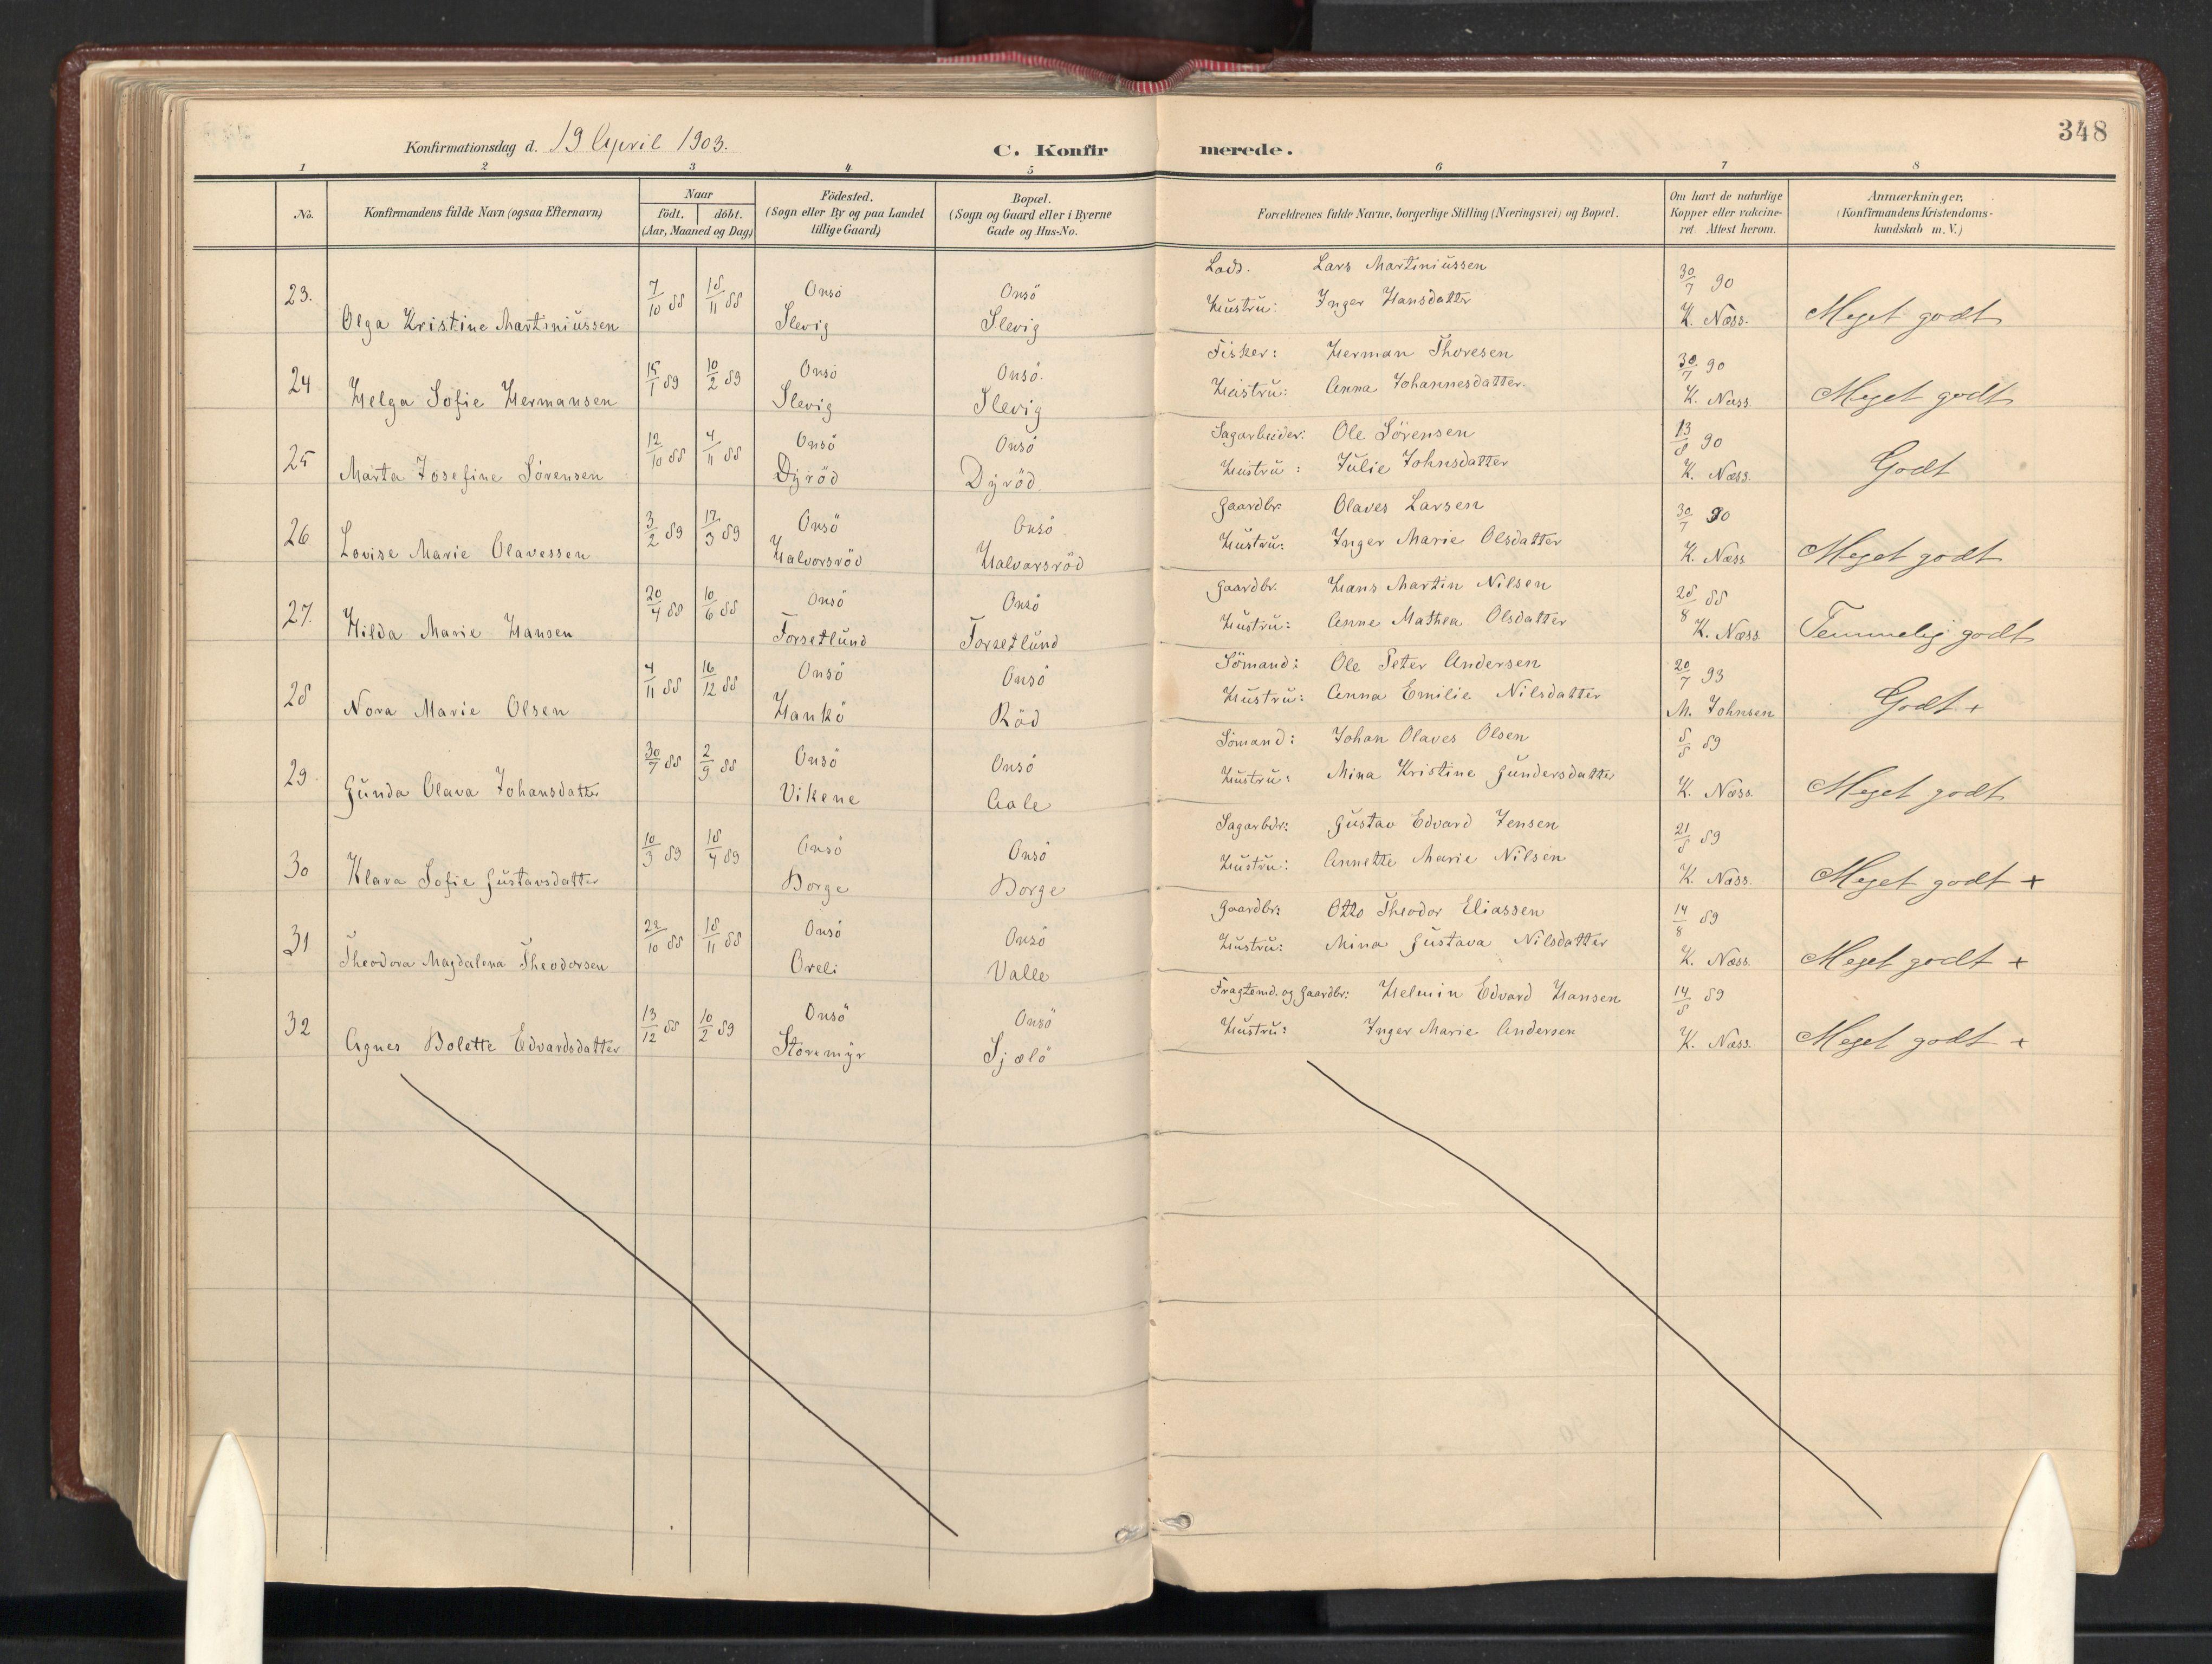 SAO, Onsøy prestekontor Kirkebøker, F/Fb: Parish register (official) no. II 1, 1901-1937, p. 348